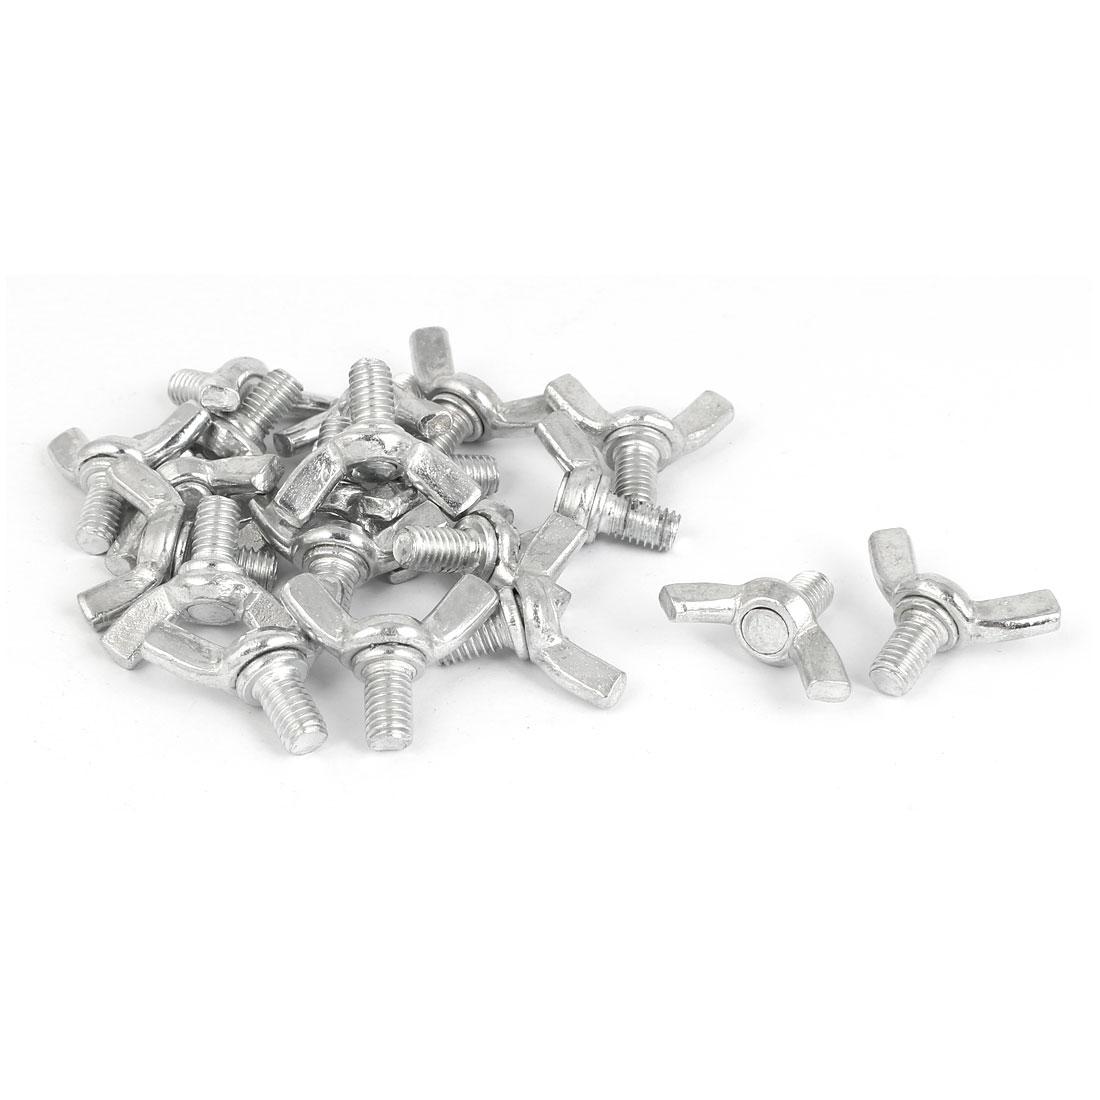 M6x10mm Thread Carbon Steel Wing Bolt Butterfly Screws Silver Tone 20pcs